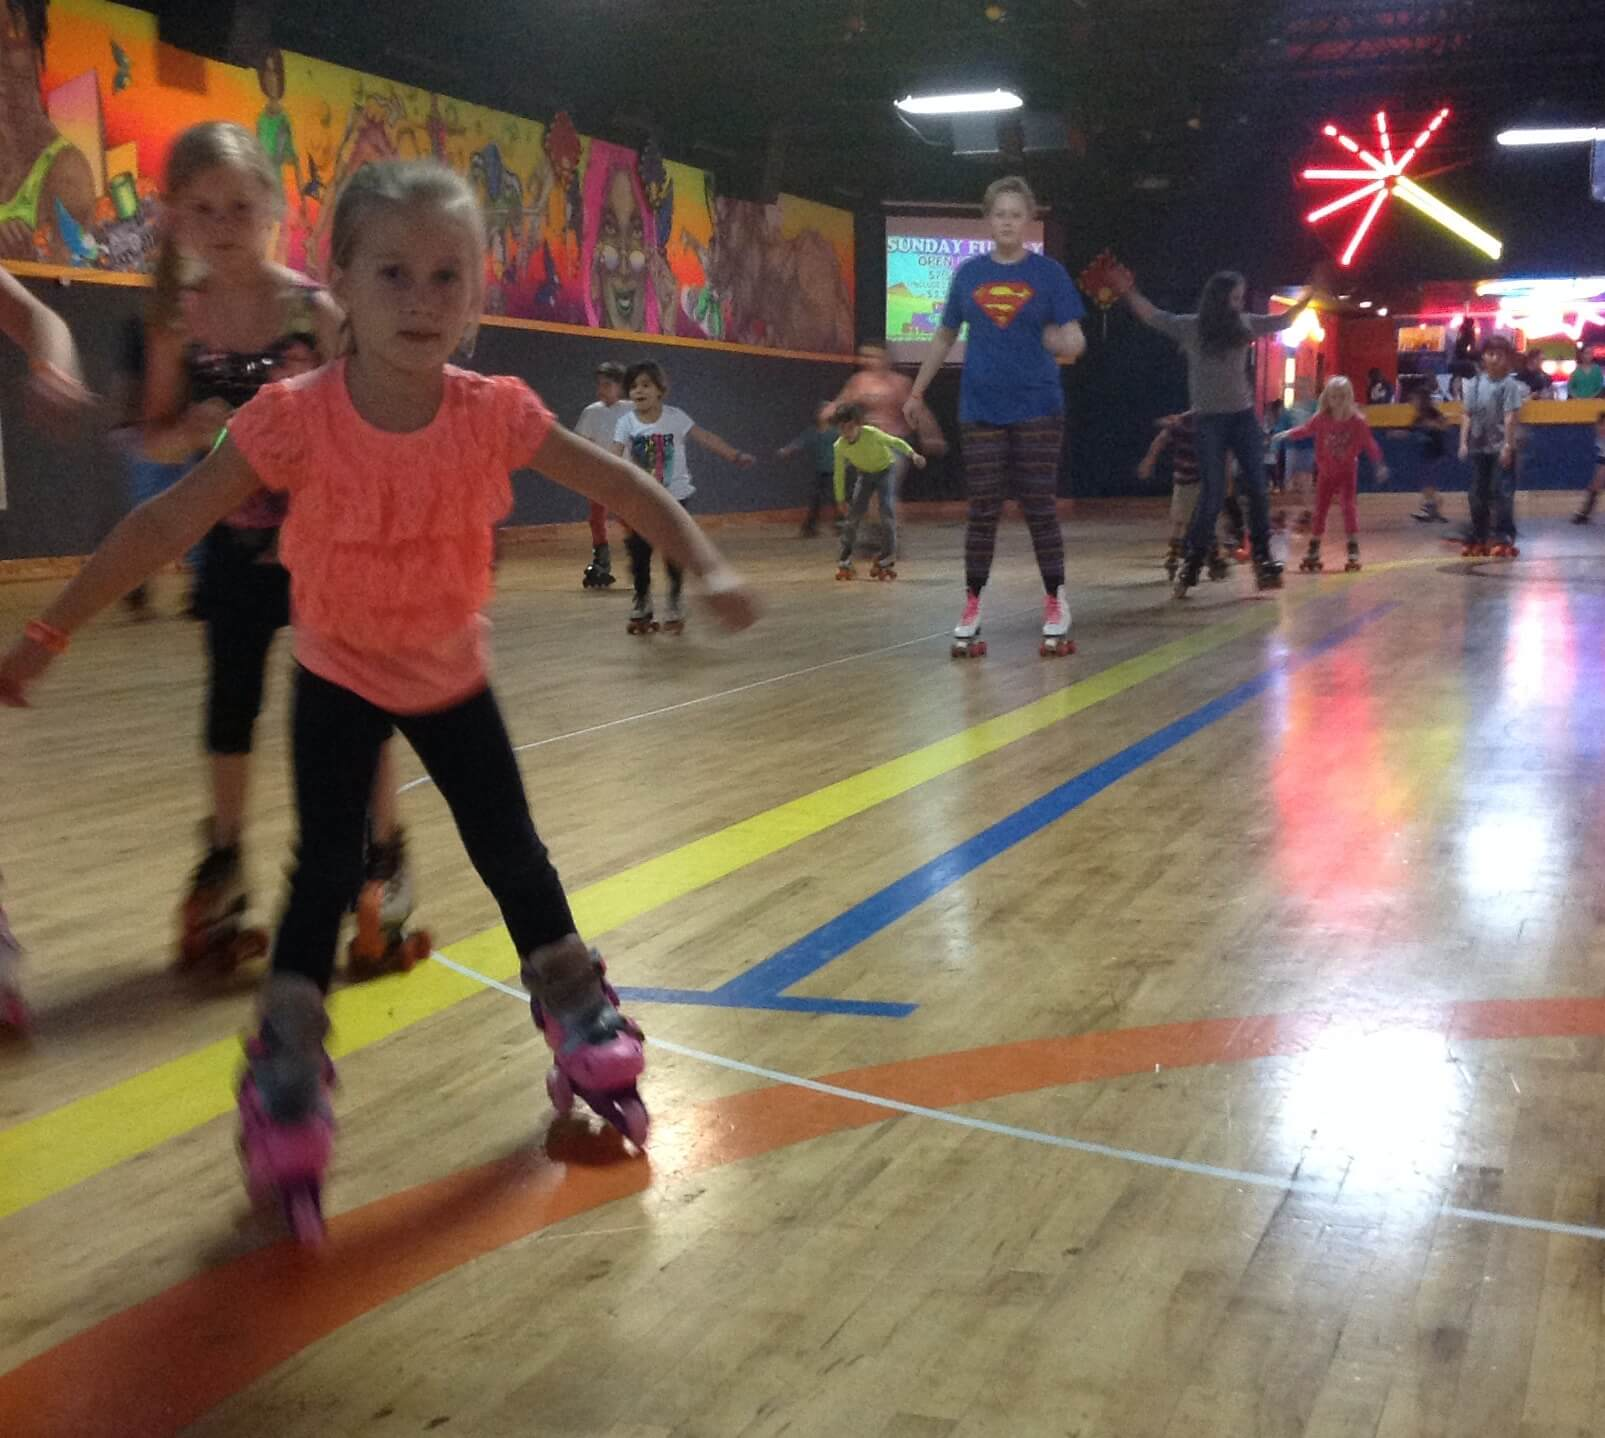 Roller skating rink music - Rollerskating